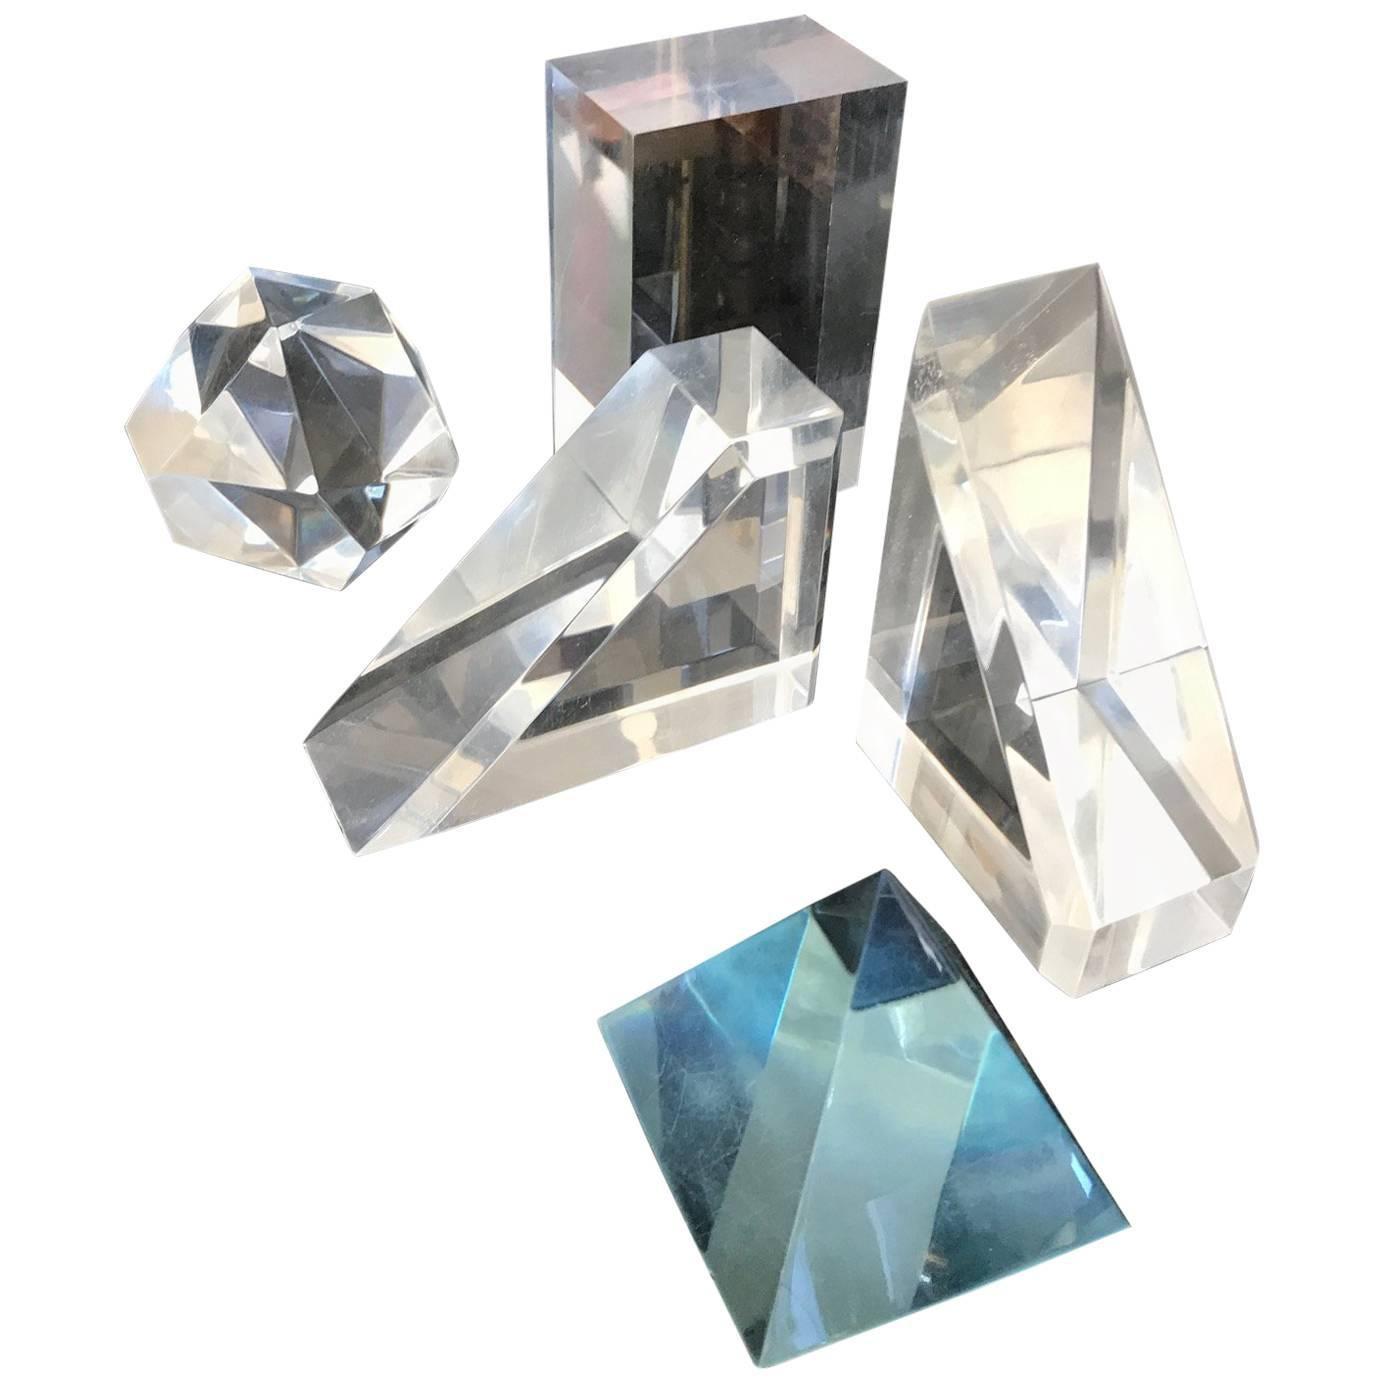 Set of Five Lucite Decorative Geometric Sculptures